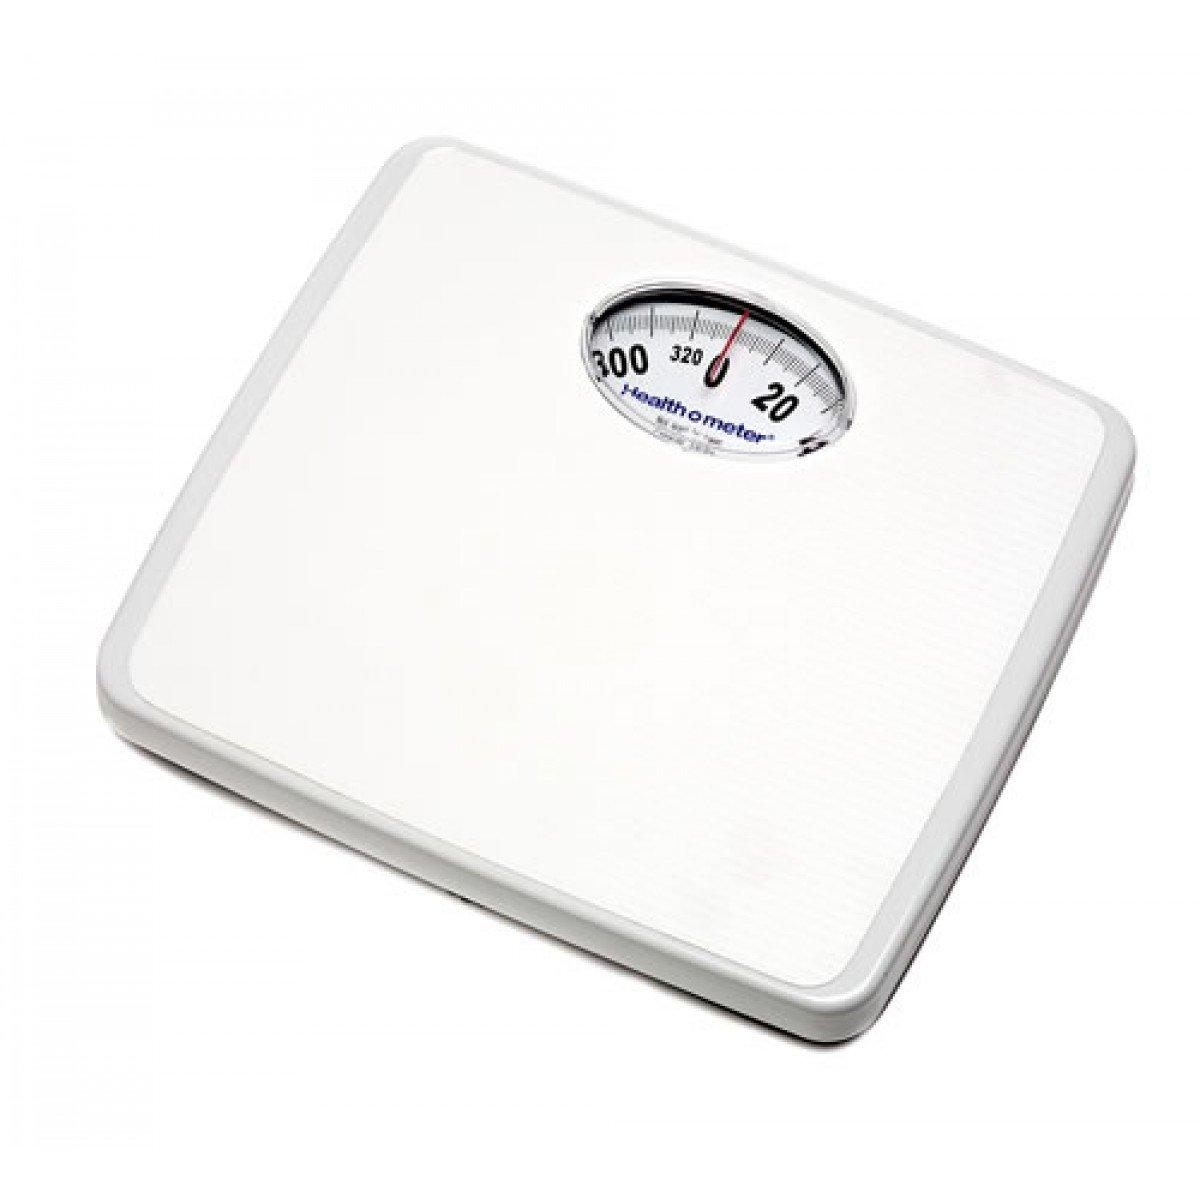 Health o meter 175LB Mechanical Dial Scale 330 lb Capacity by Pelstar LLC Health Prods